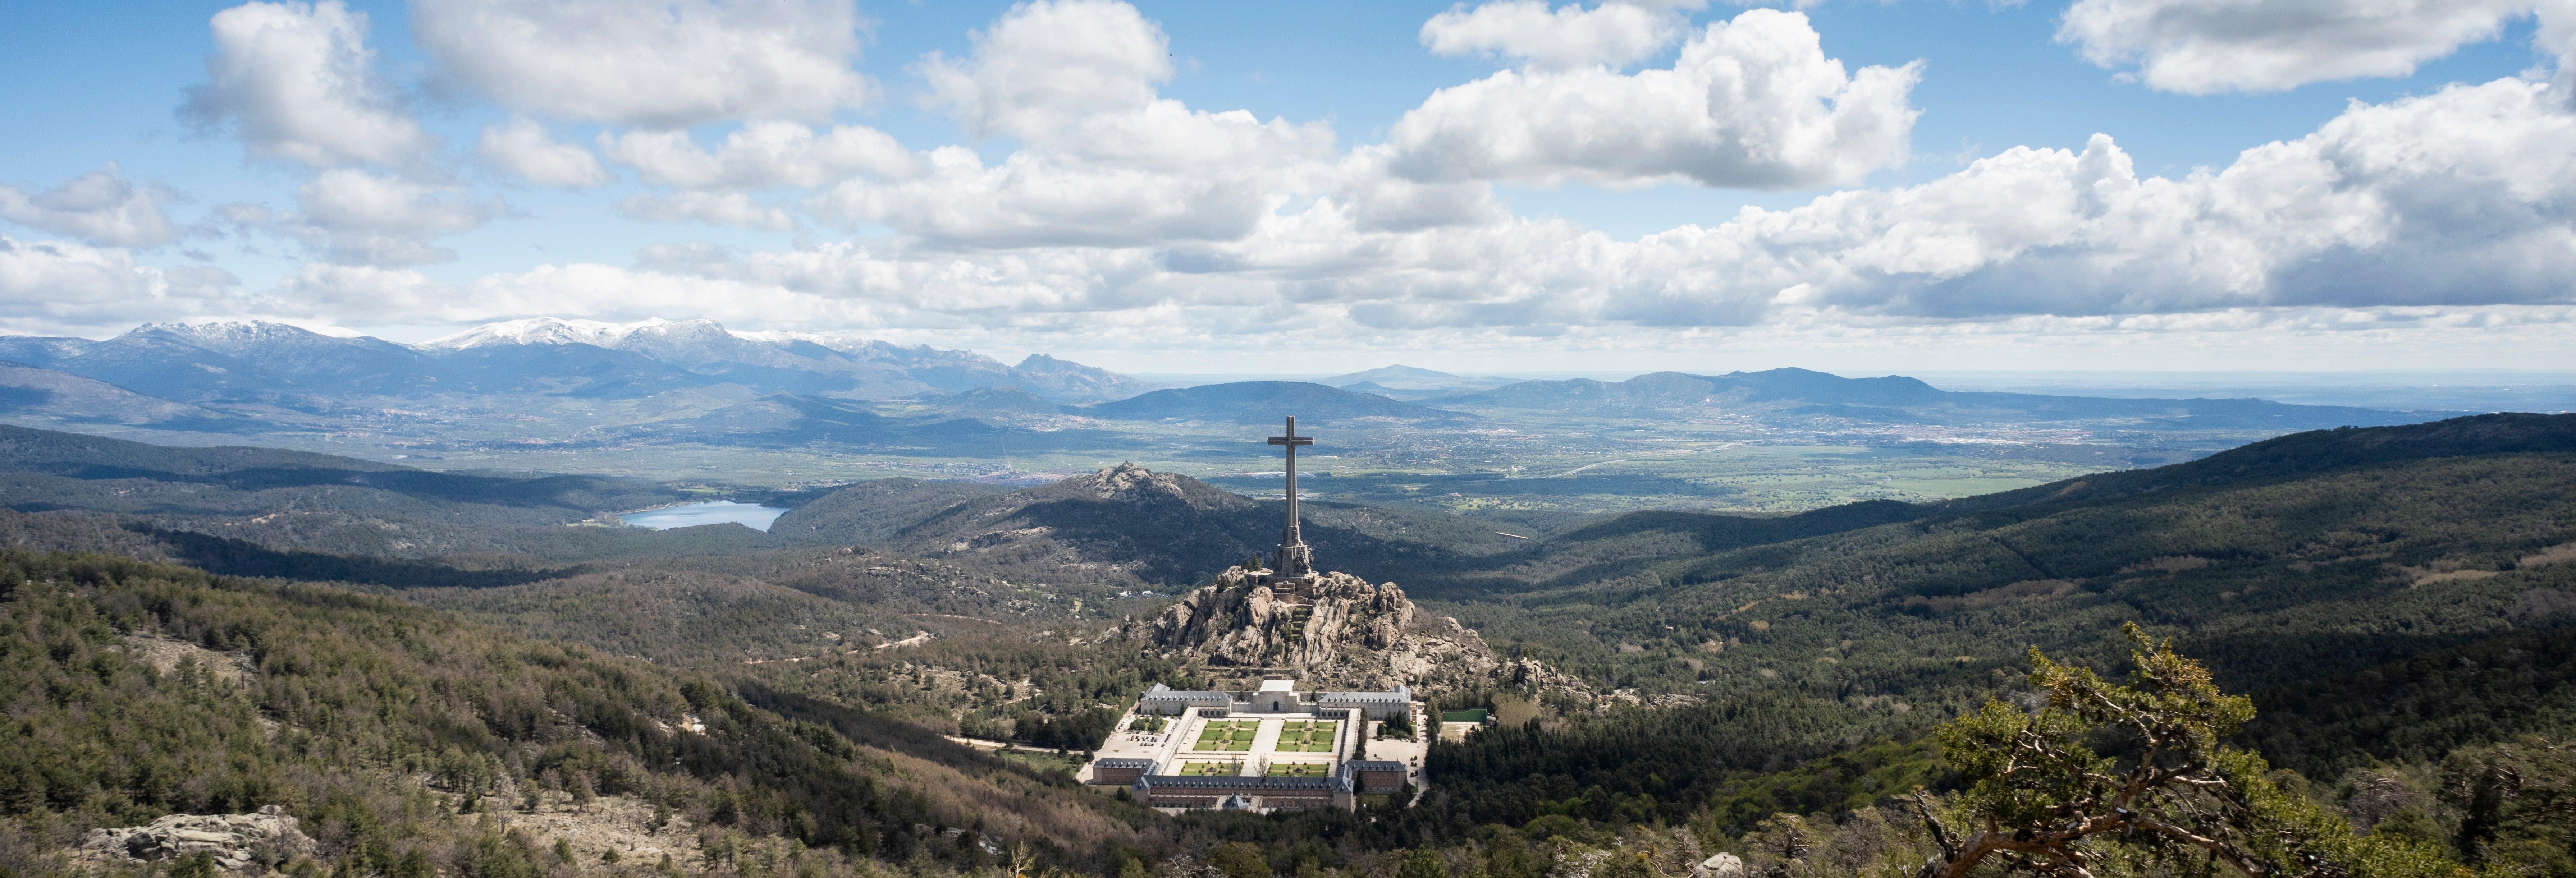 Toledo, El Escorial & Valley of the Fallen Day Trip